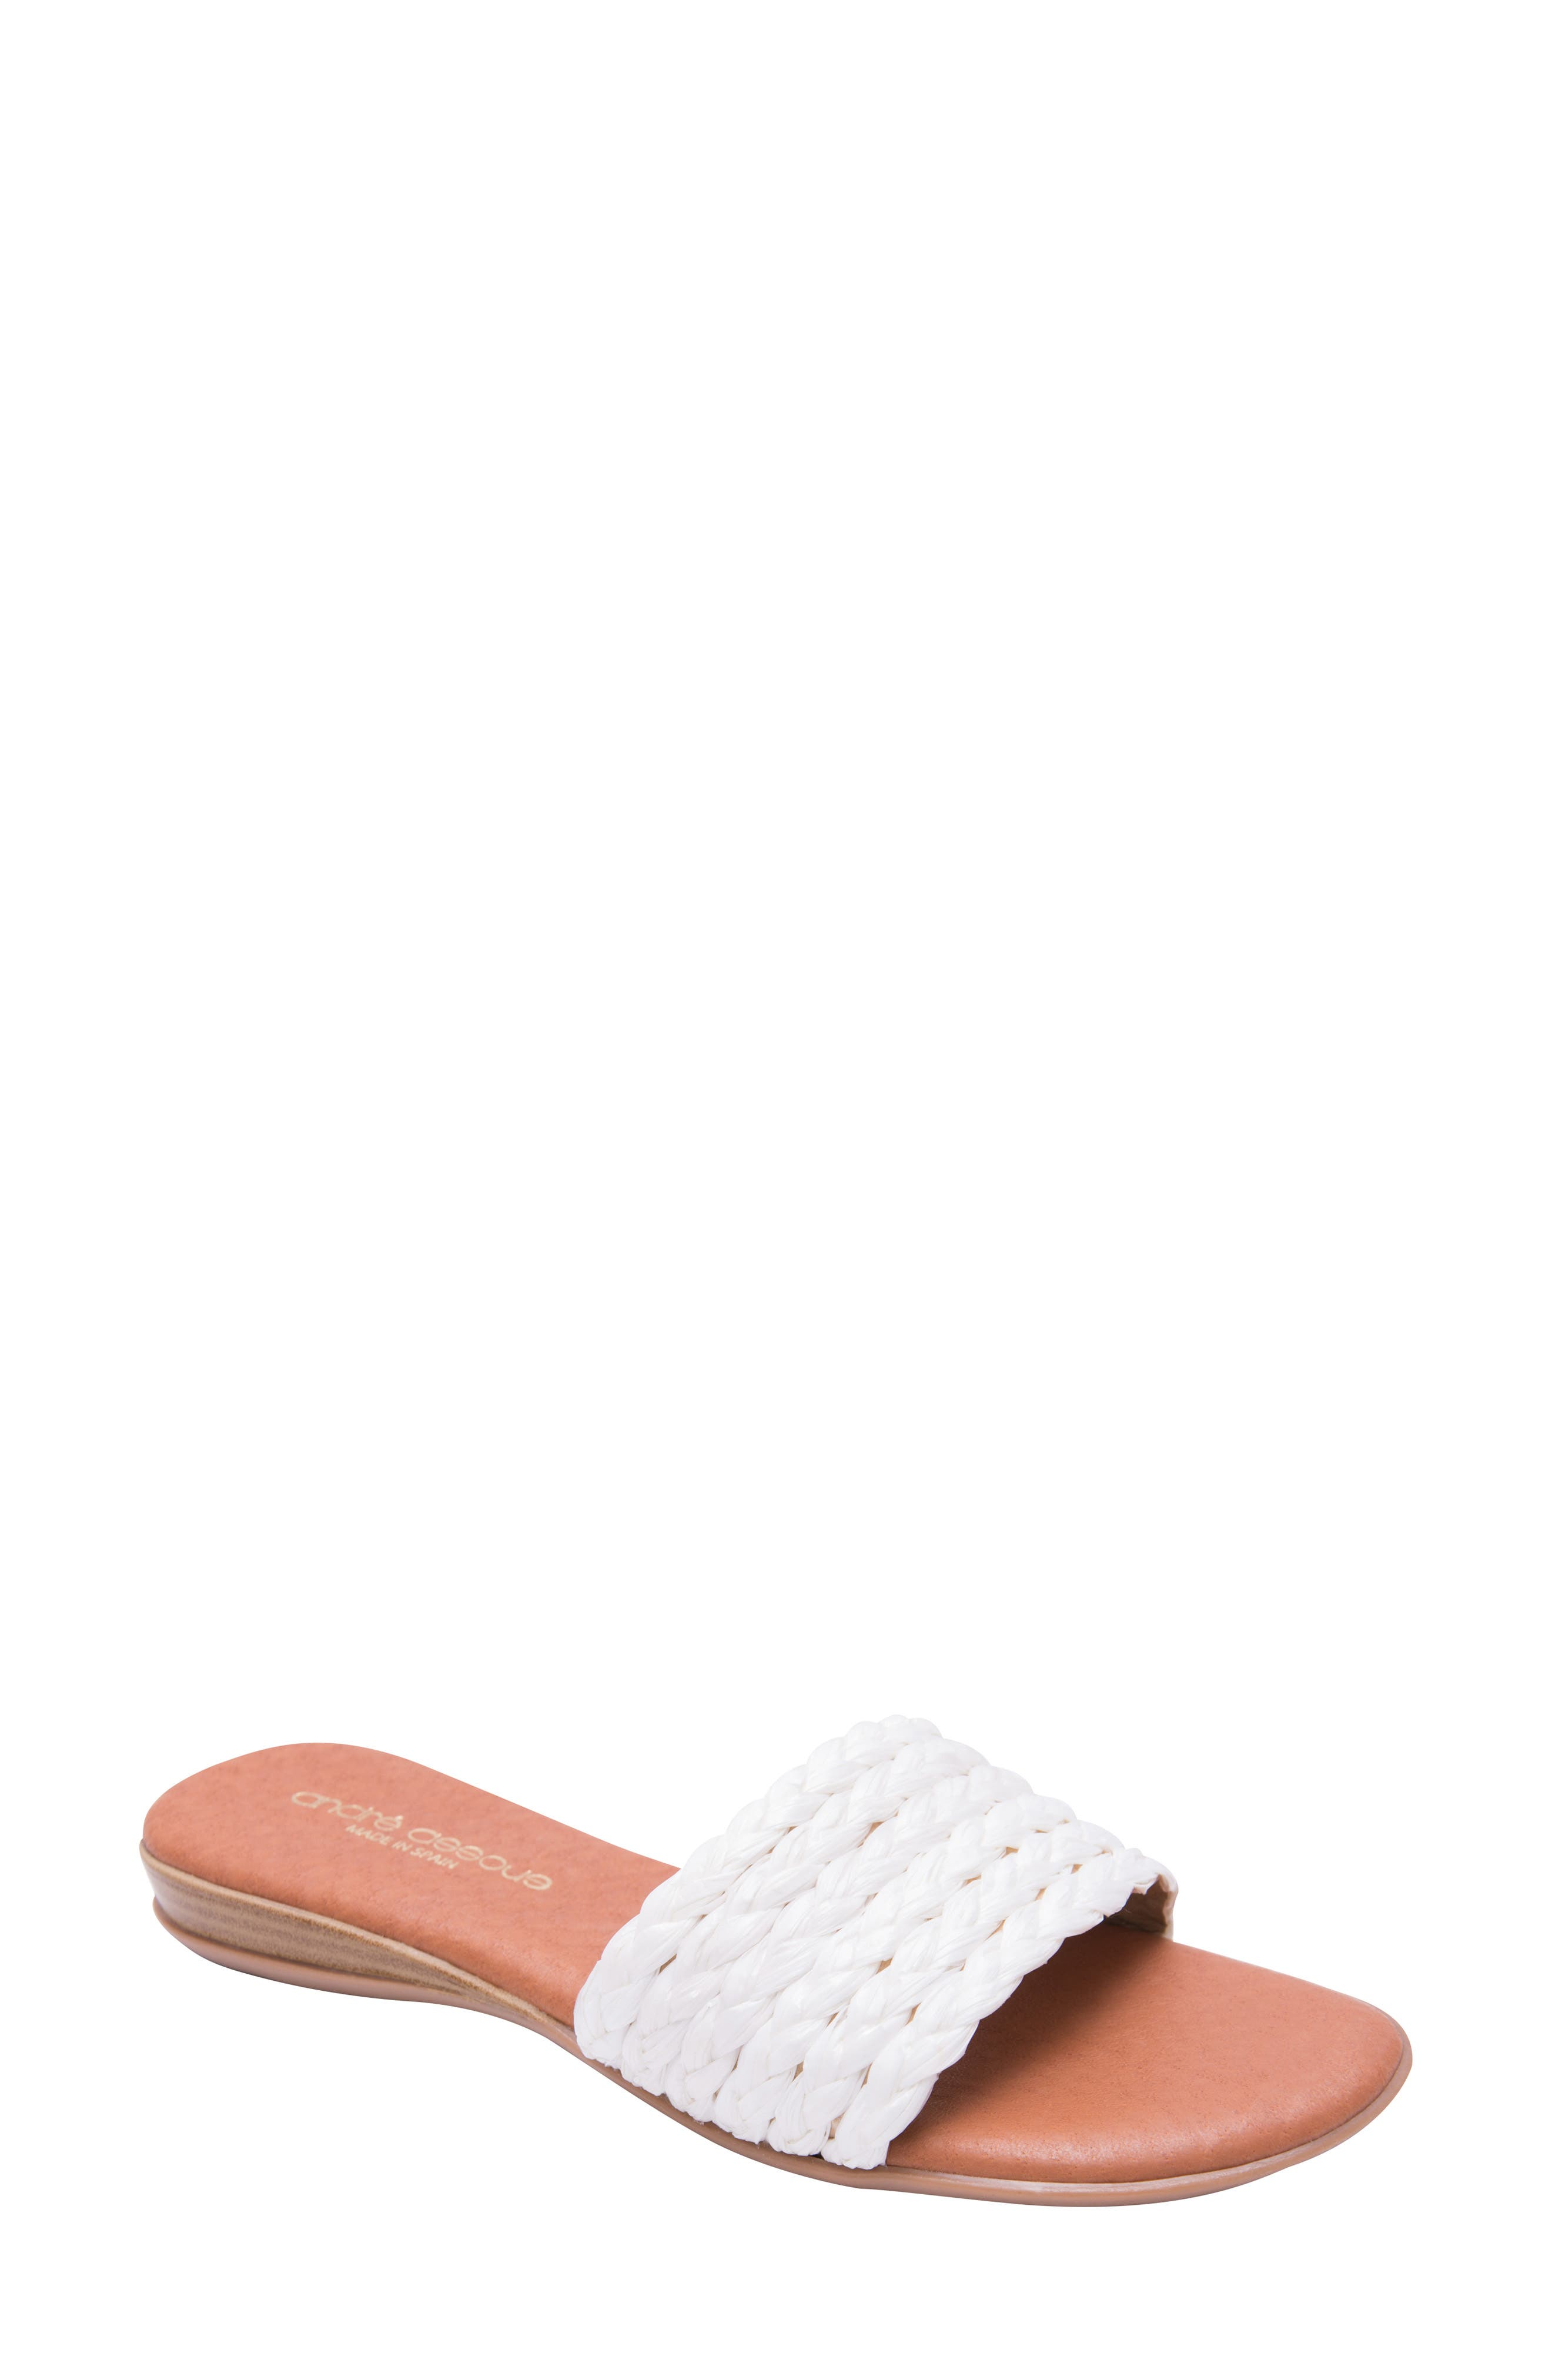 Nahala Slide Sandal